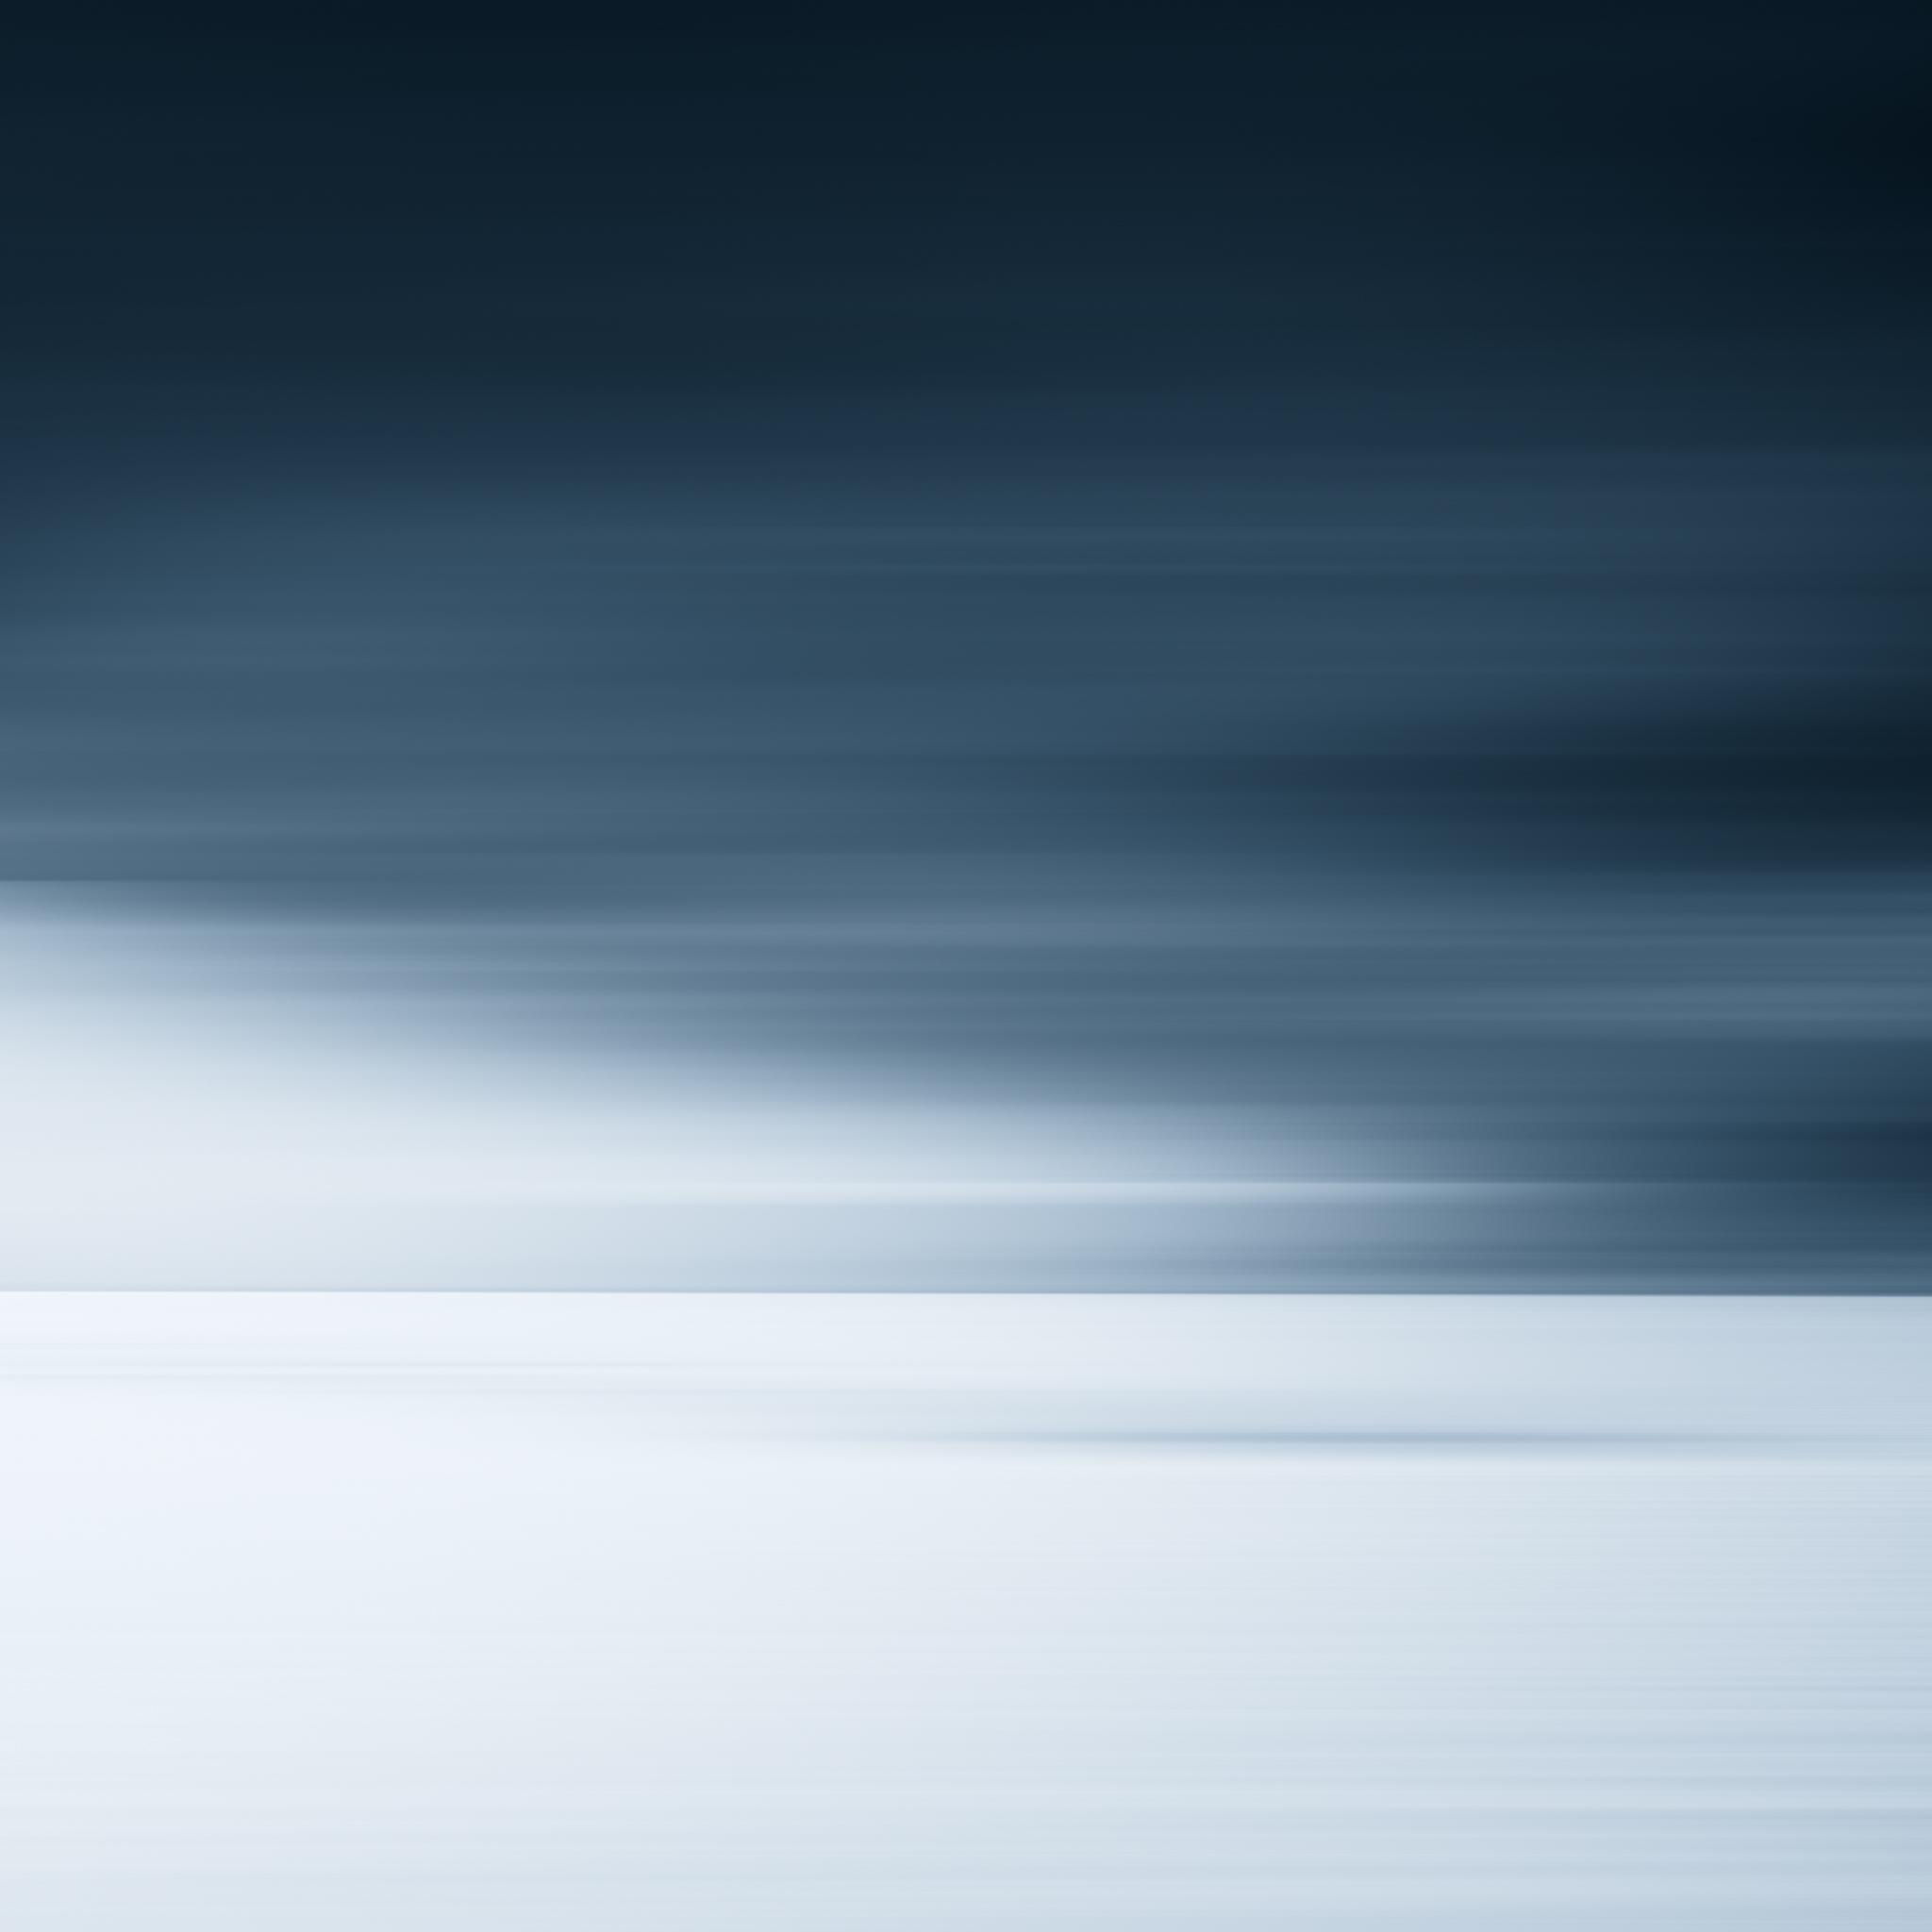 Filename iPad mini retina wallpaper HD color ios7 parallax 3jpg 2048x2048